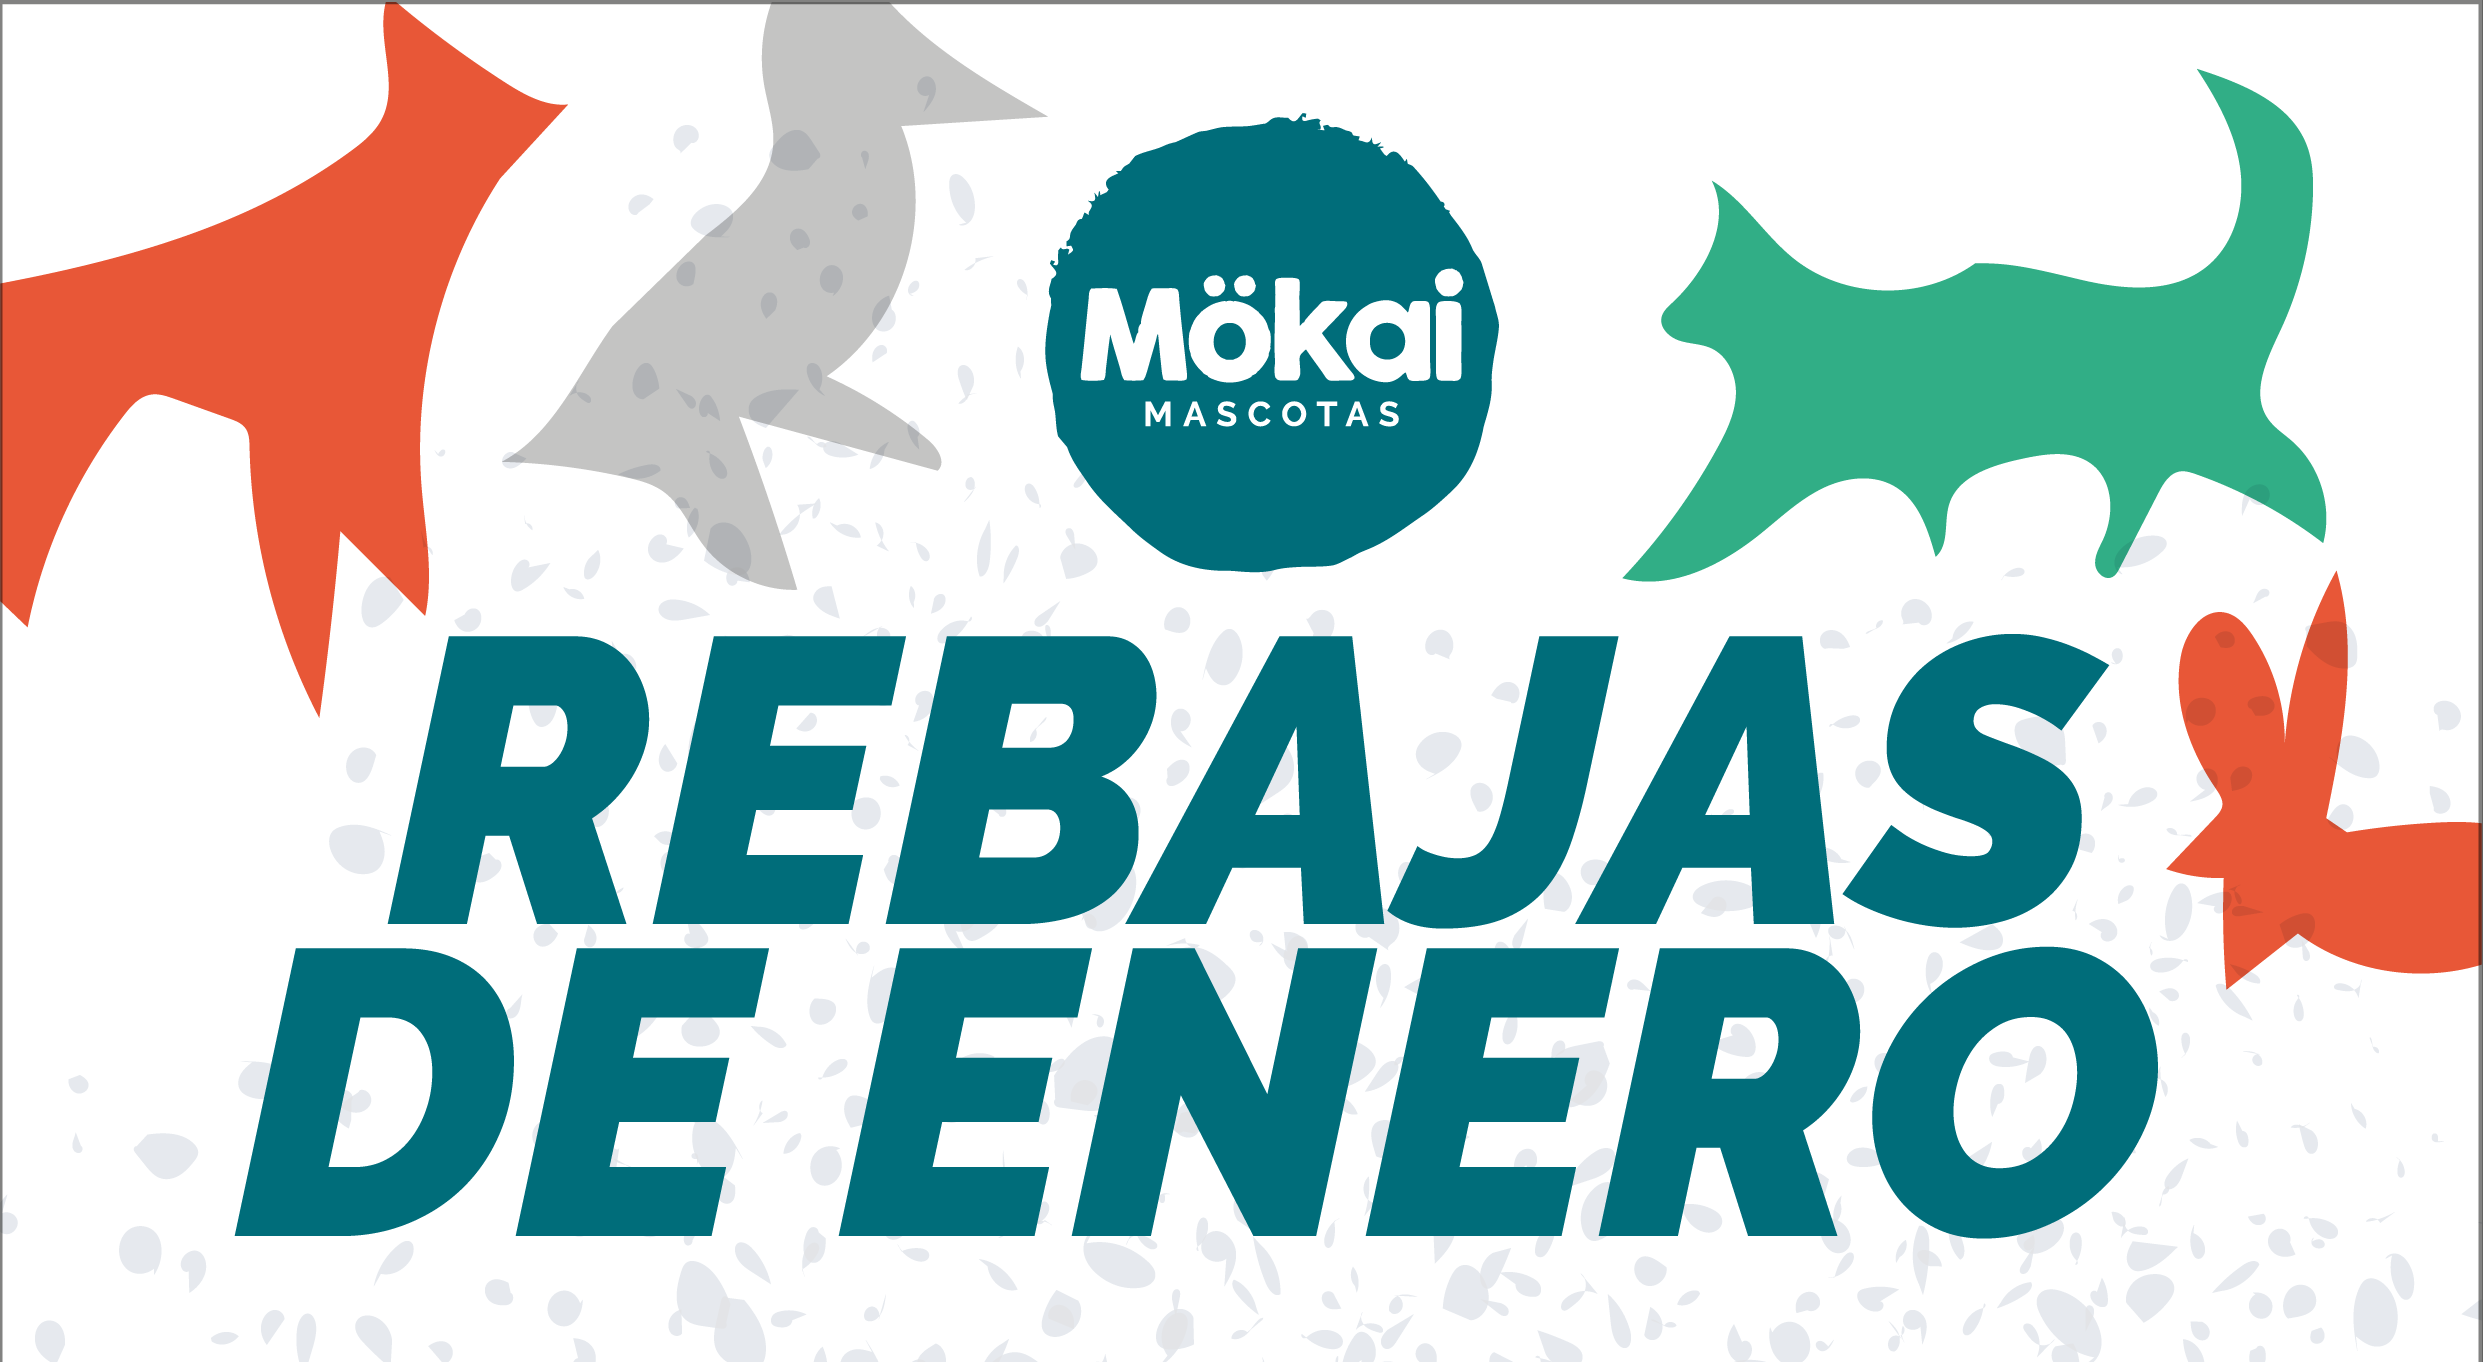 http://www.mokaimascotas.es/wp-content/uploads/2020/01/rebajas_enero.png